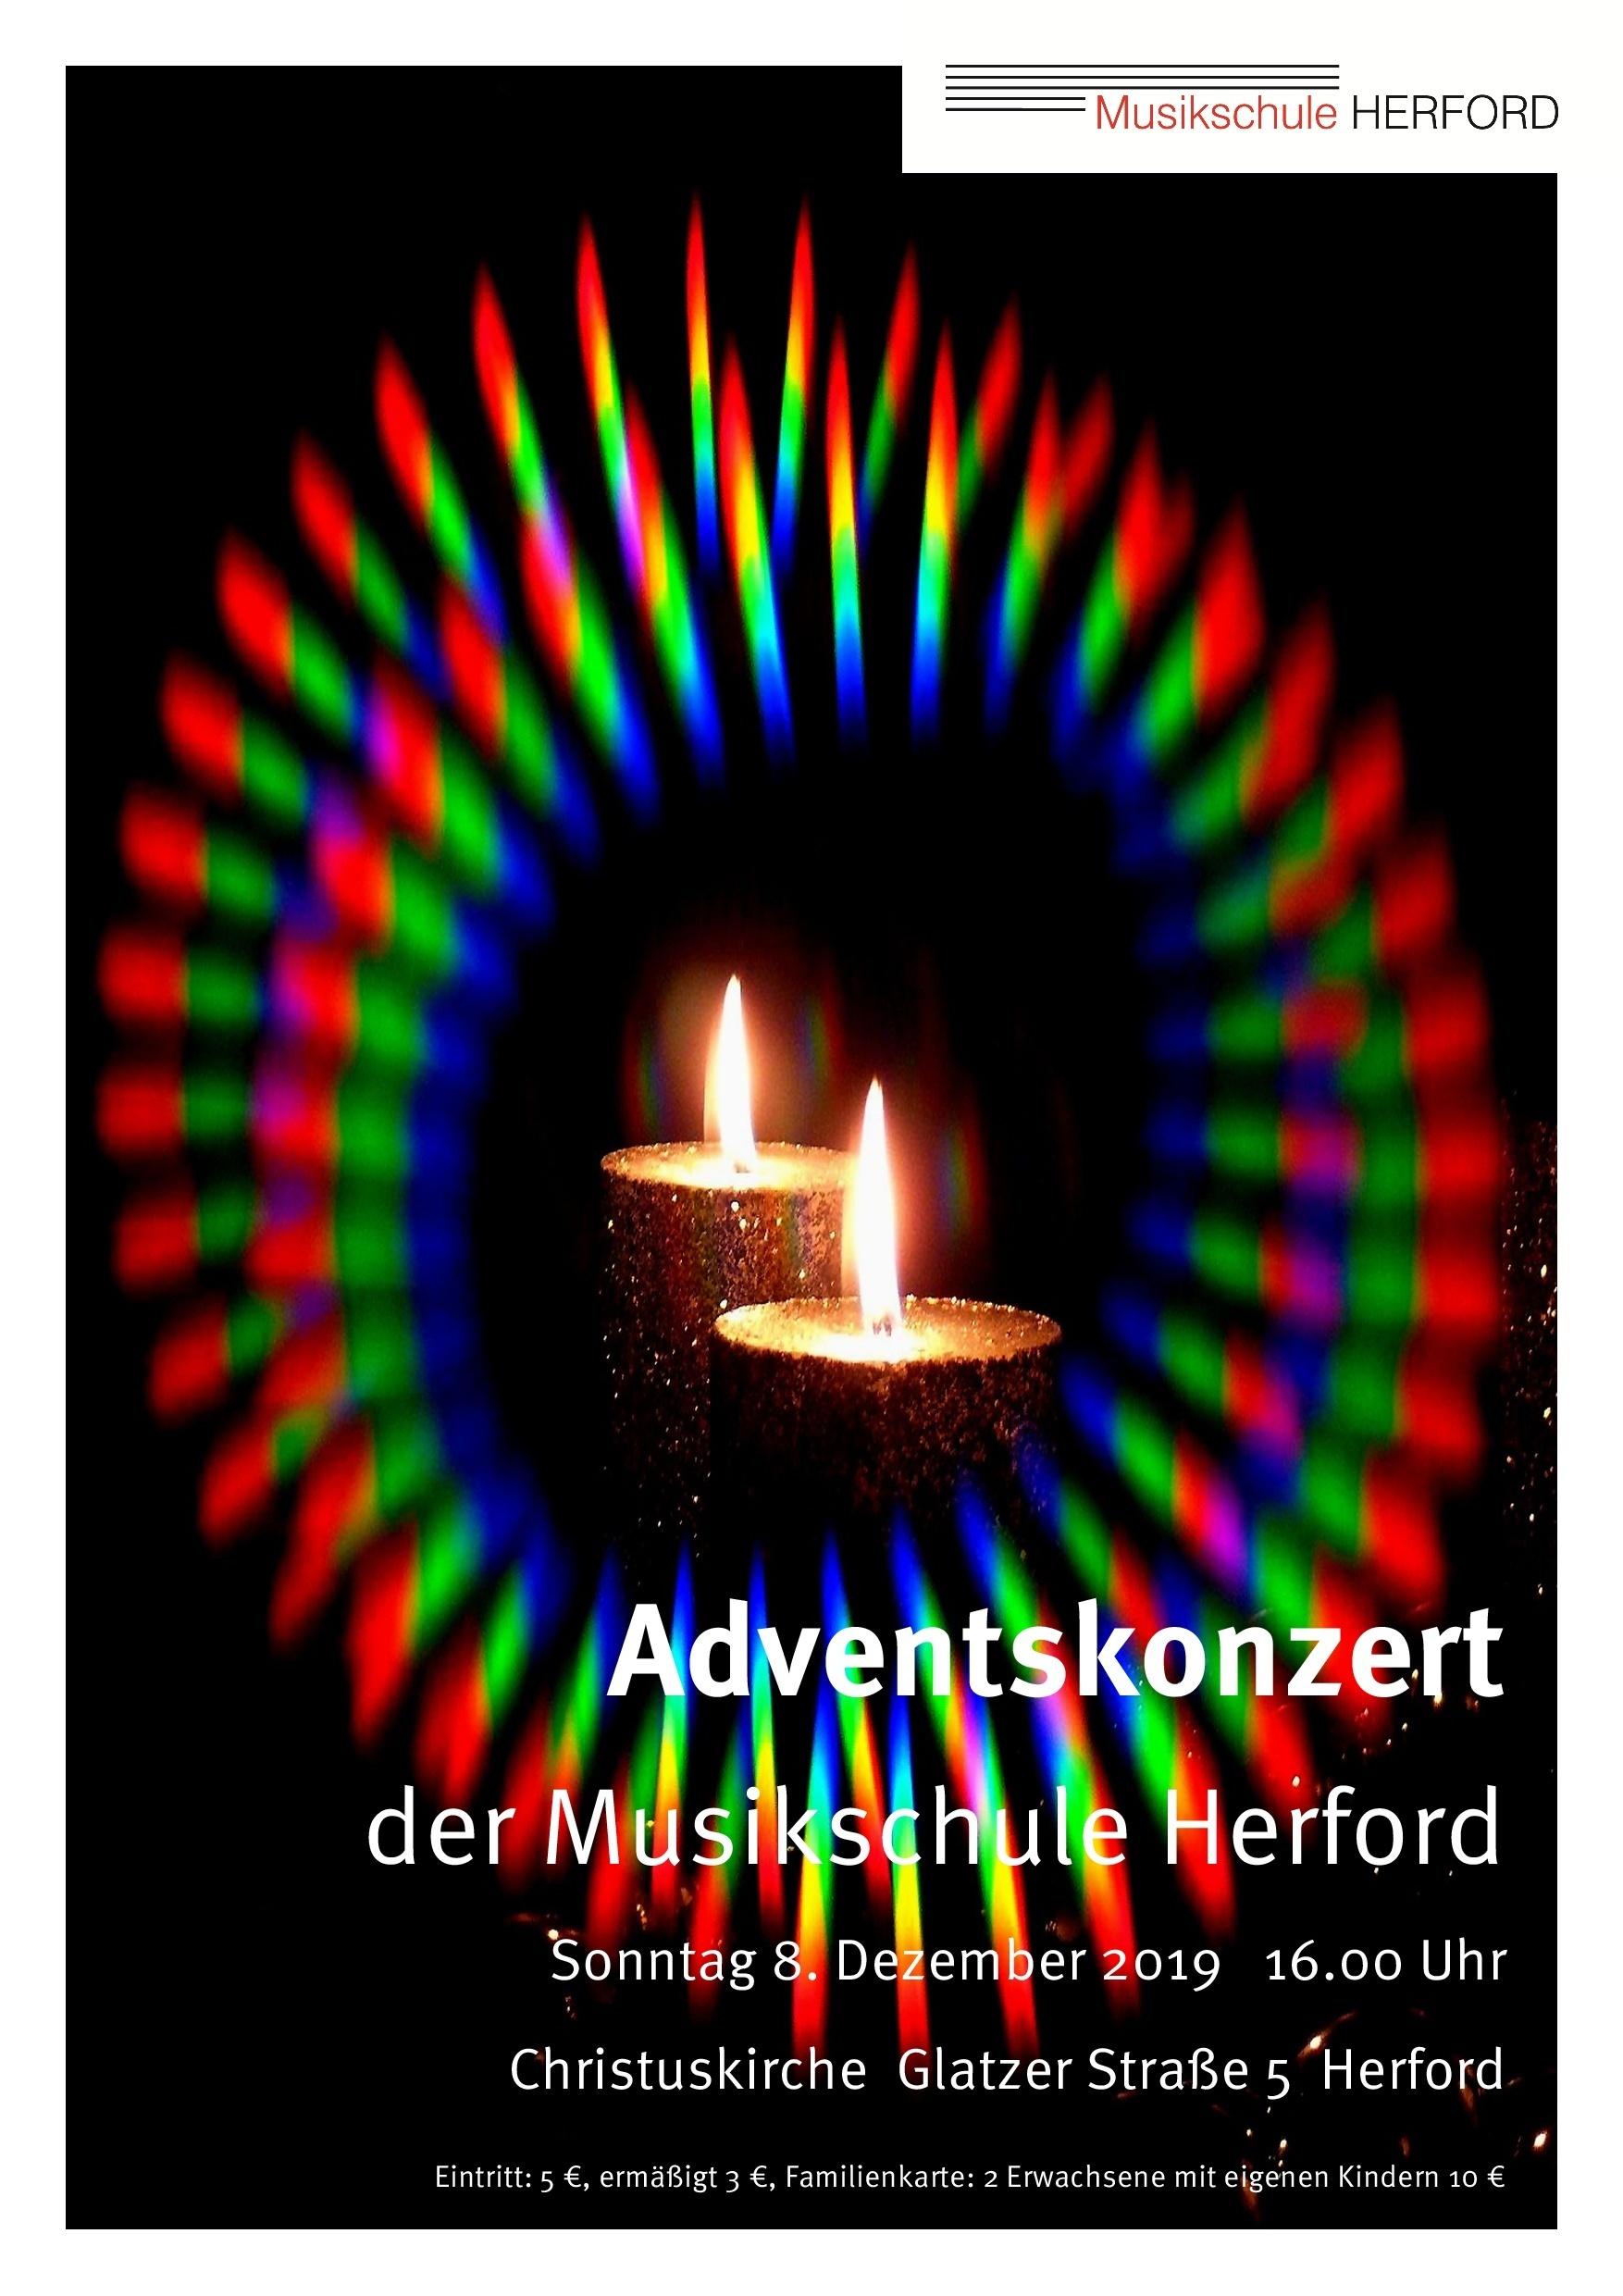 Adventskonzert